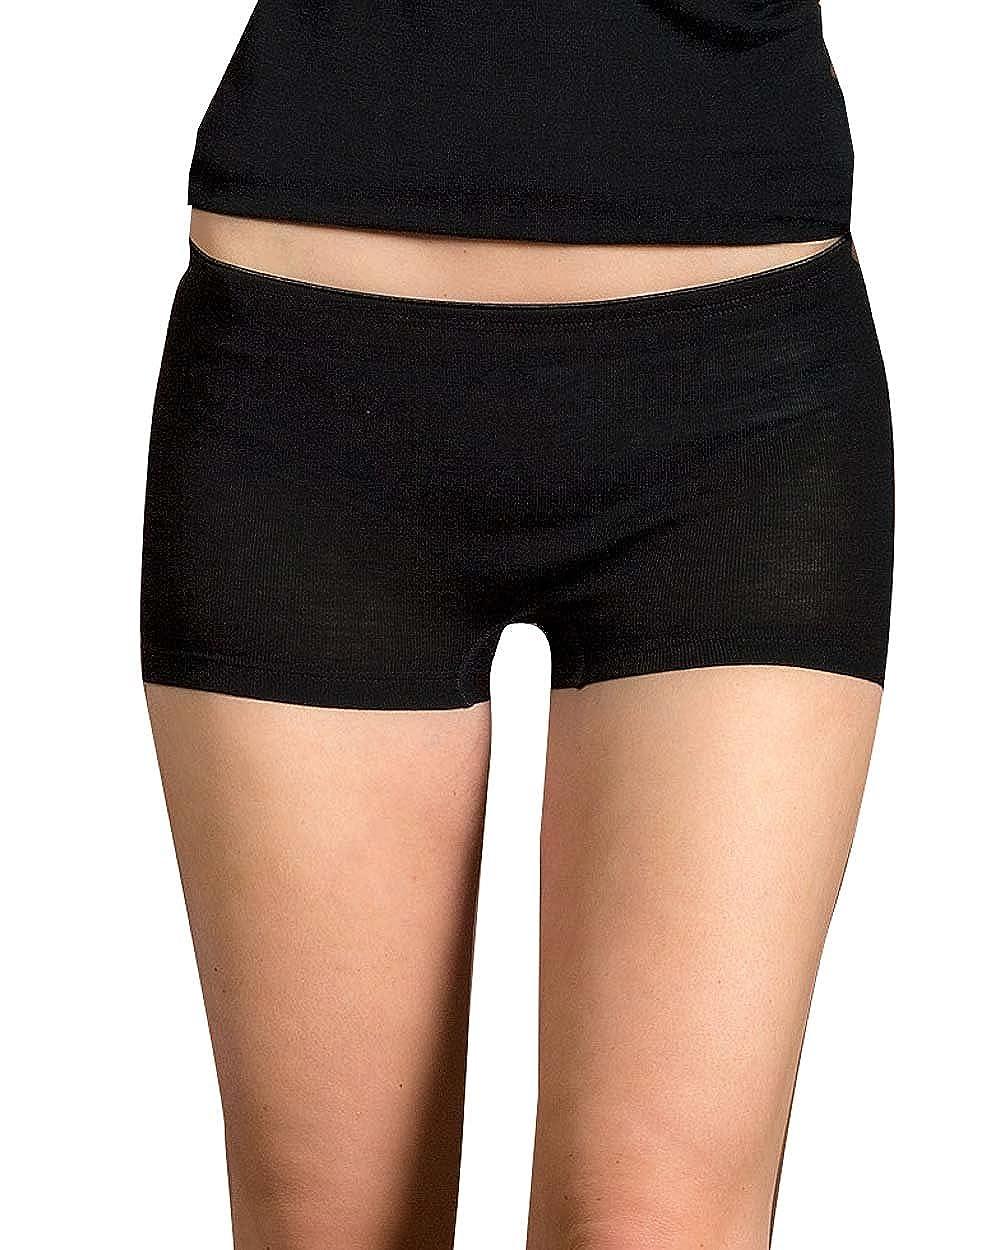 Engel Pantaloncini da donna, 70% lana merino organica, 30% seta, colore: naturale 701340